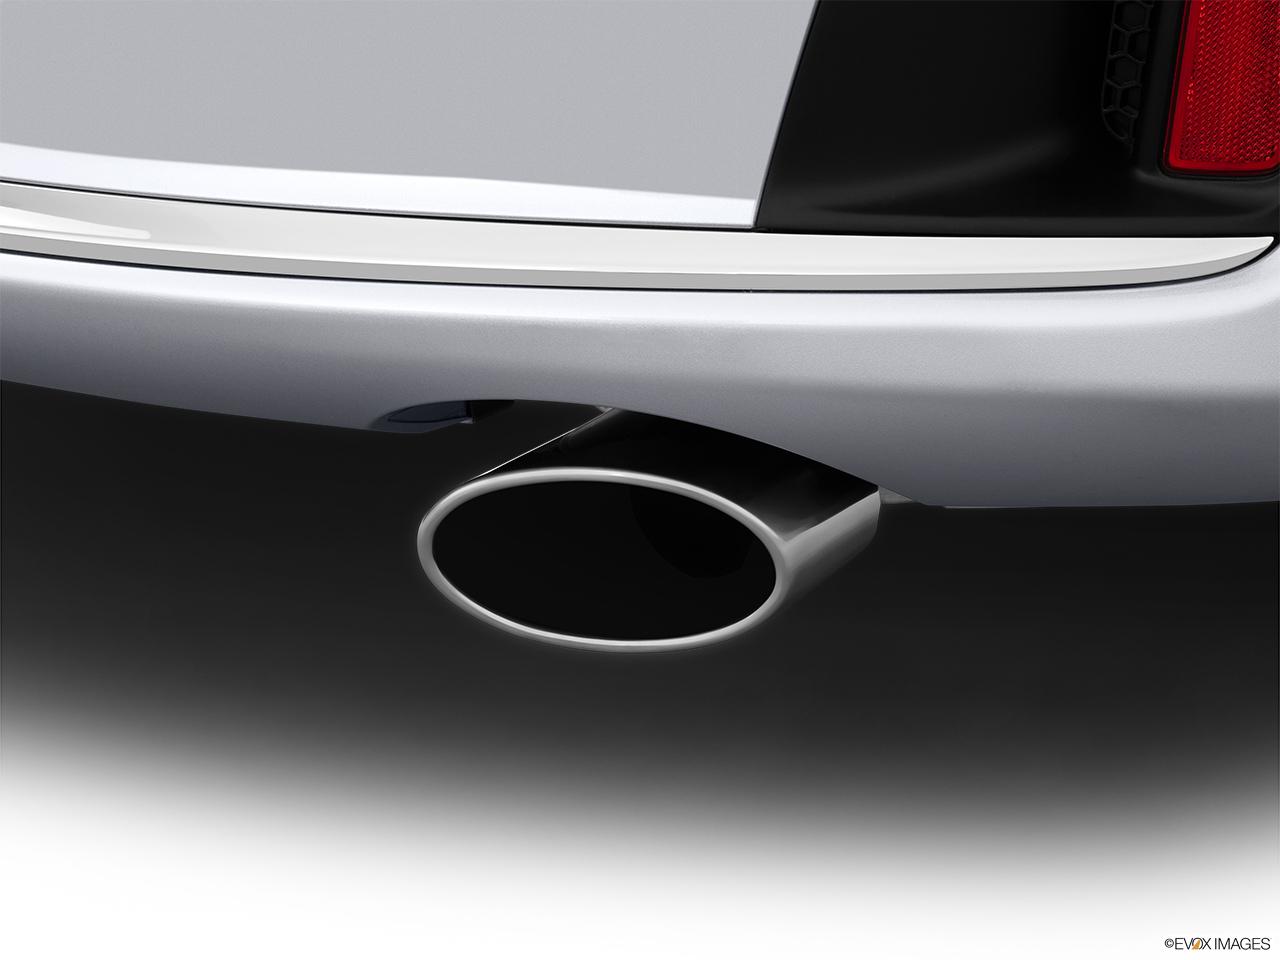 2014 Honda Accord Coupe 2 Door I4 CVT EX-L - Chrome tip